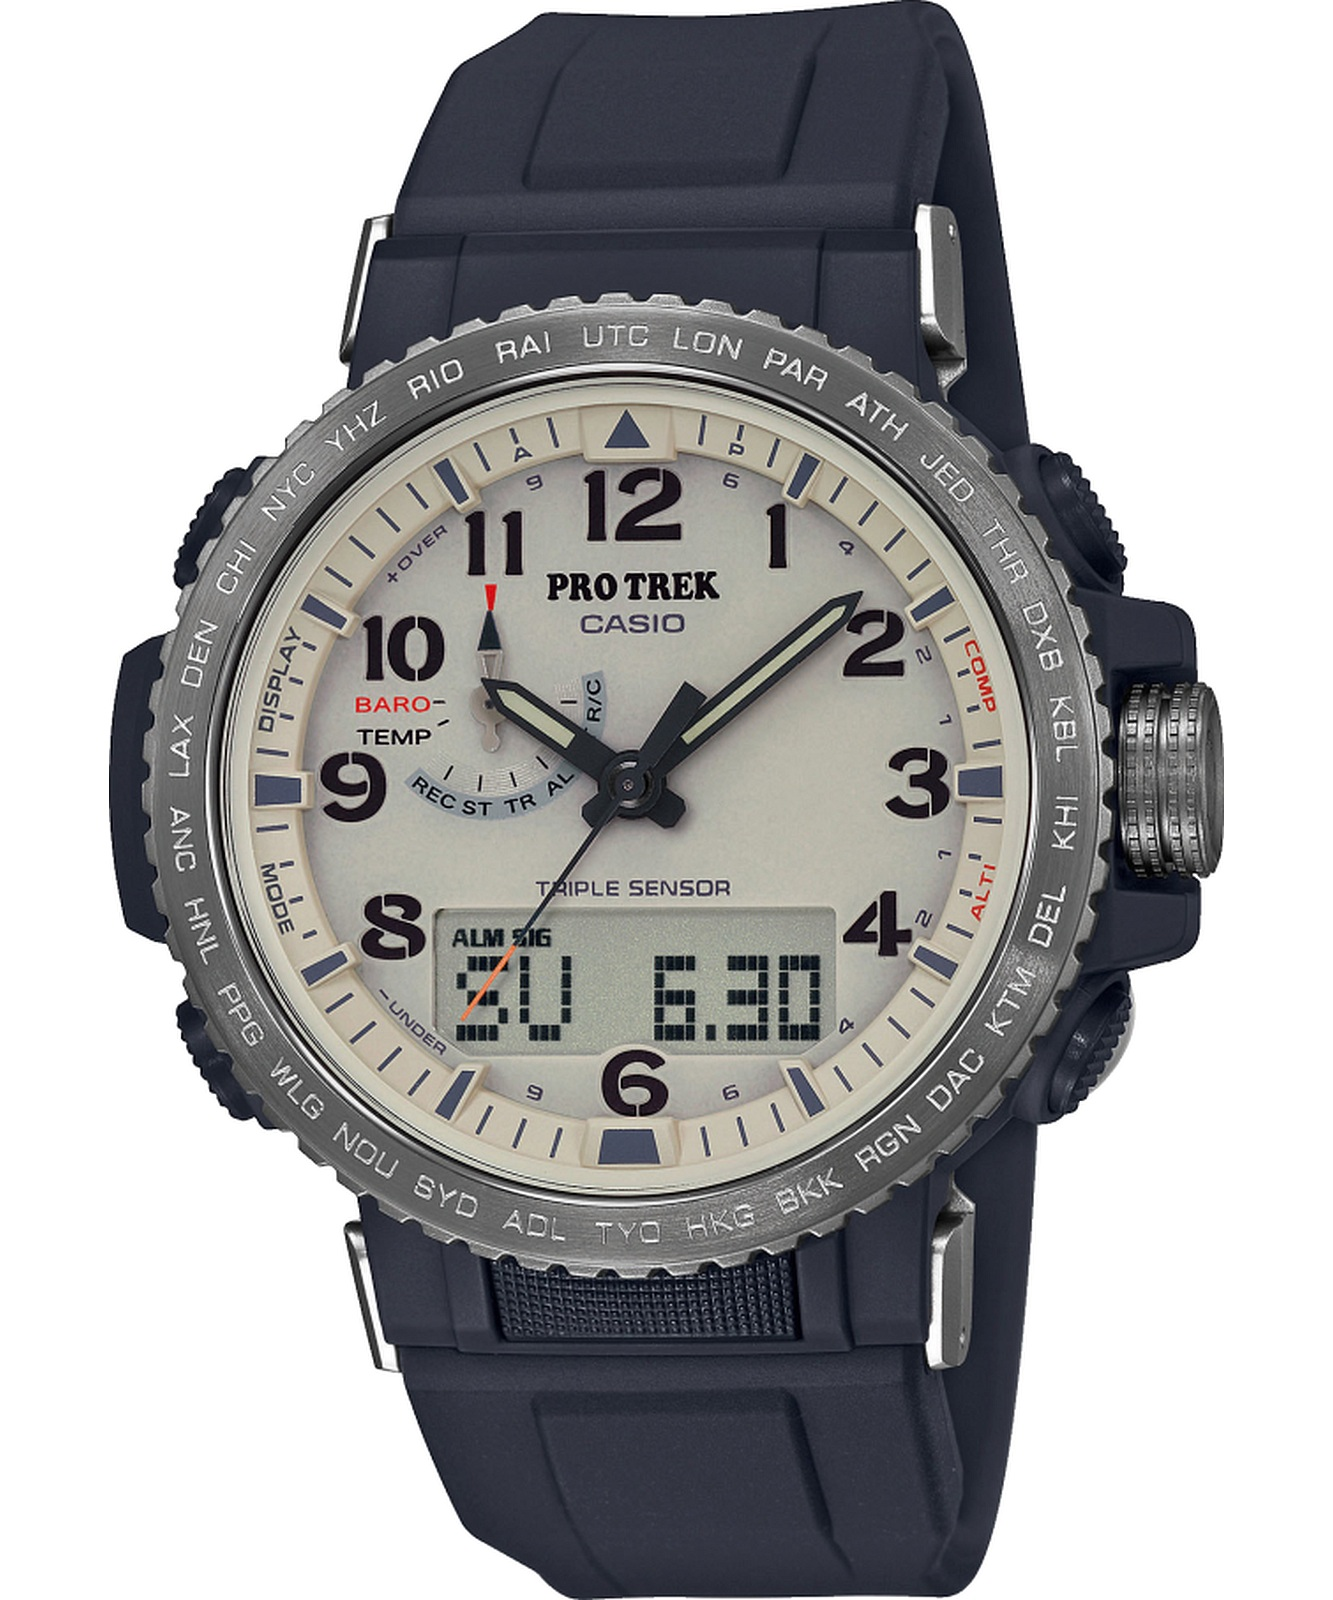 zegarek-meski-protrek-slim-design-radio-solar-prw-50y-1ber